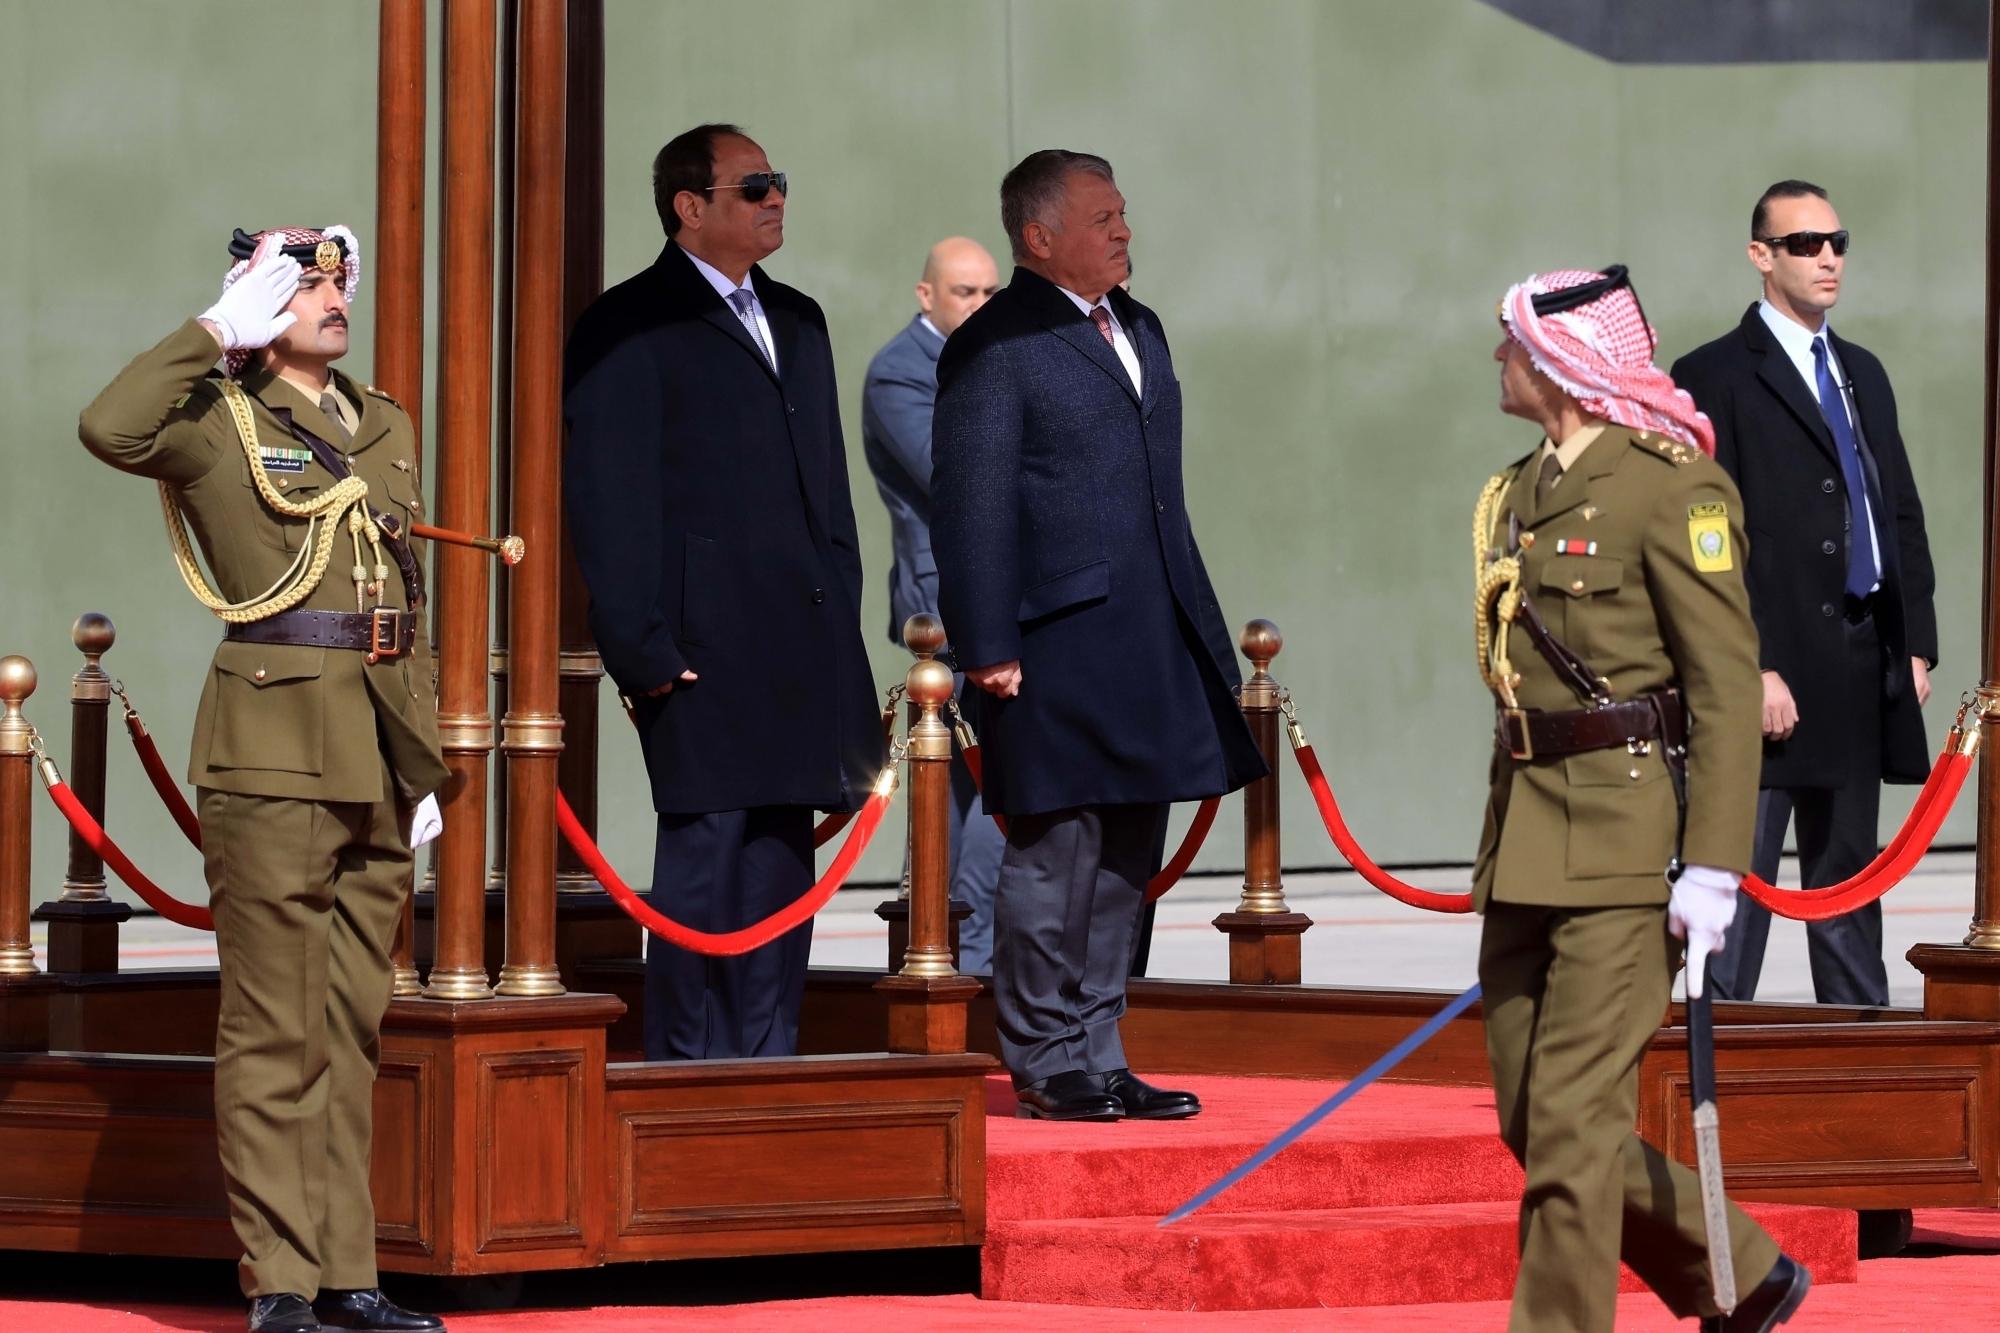 Egypt president el-Sissi visits Sudan amid rapprochement